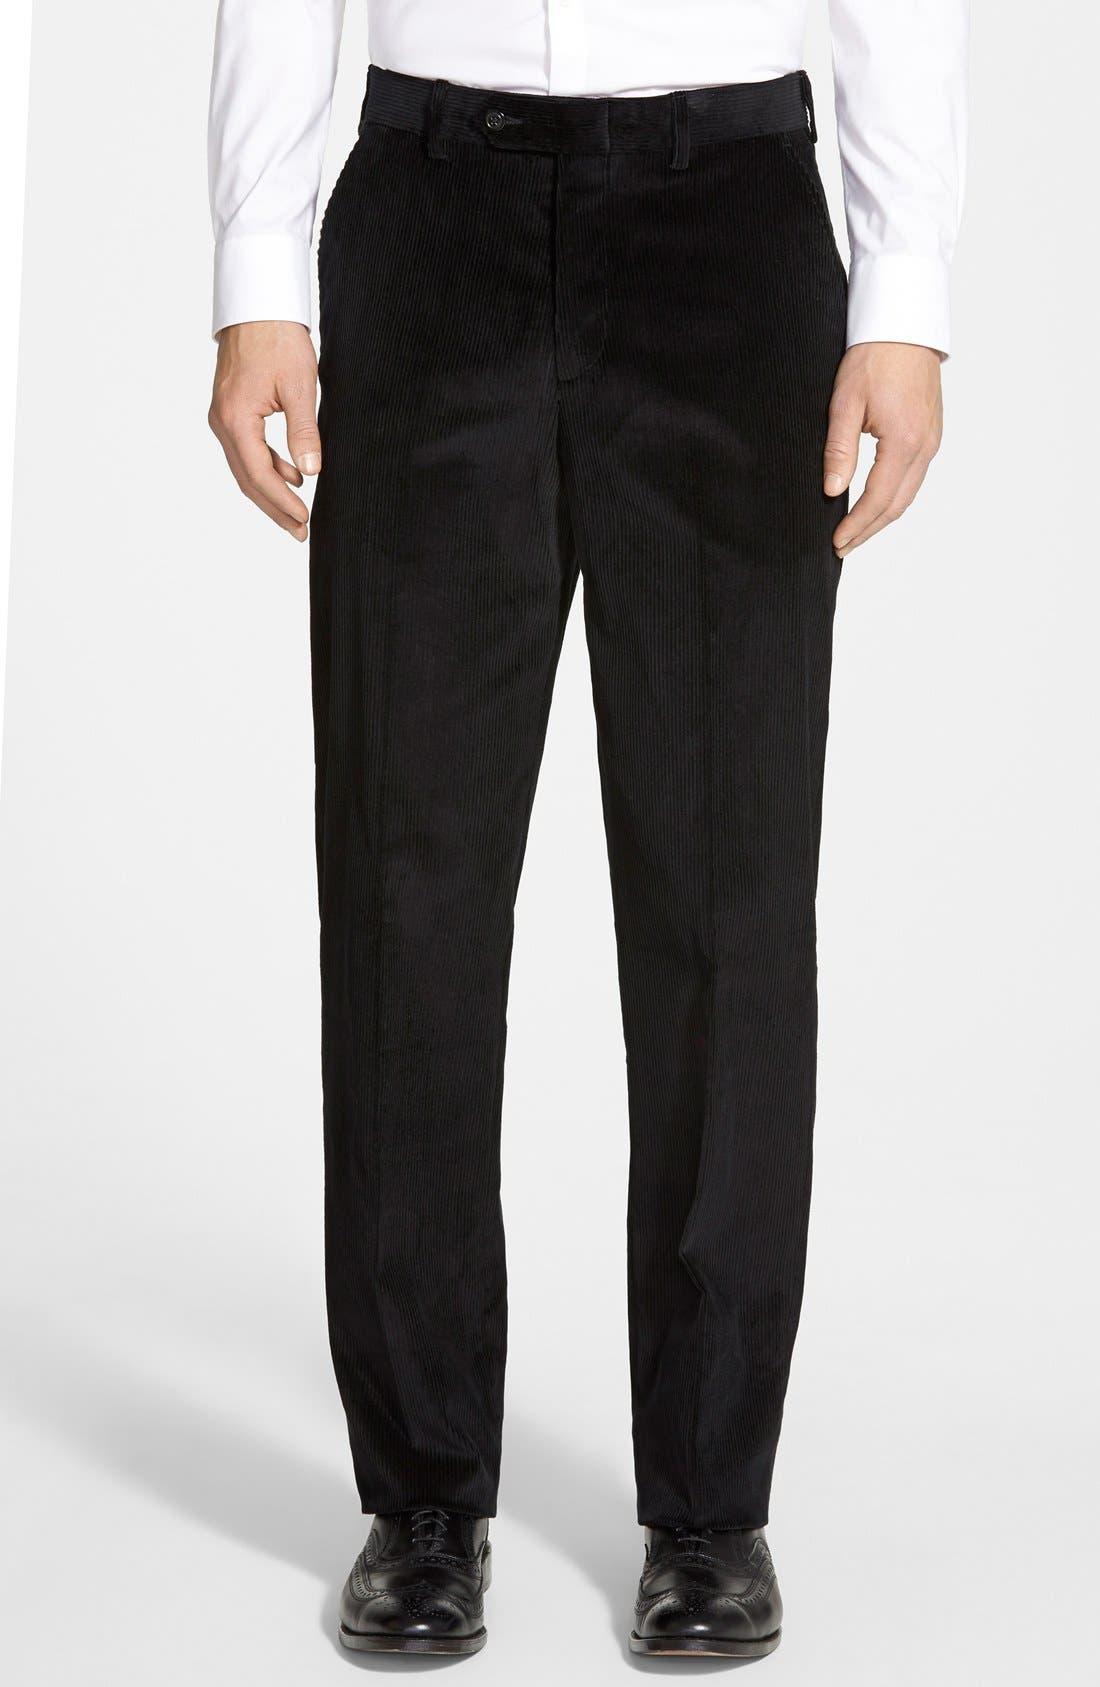 Flat Front Corduroy Trousers,                         Main,                         color, Black